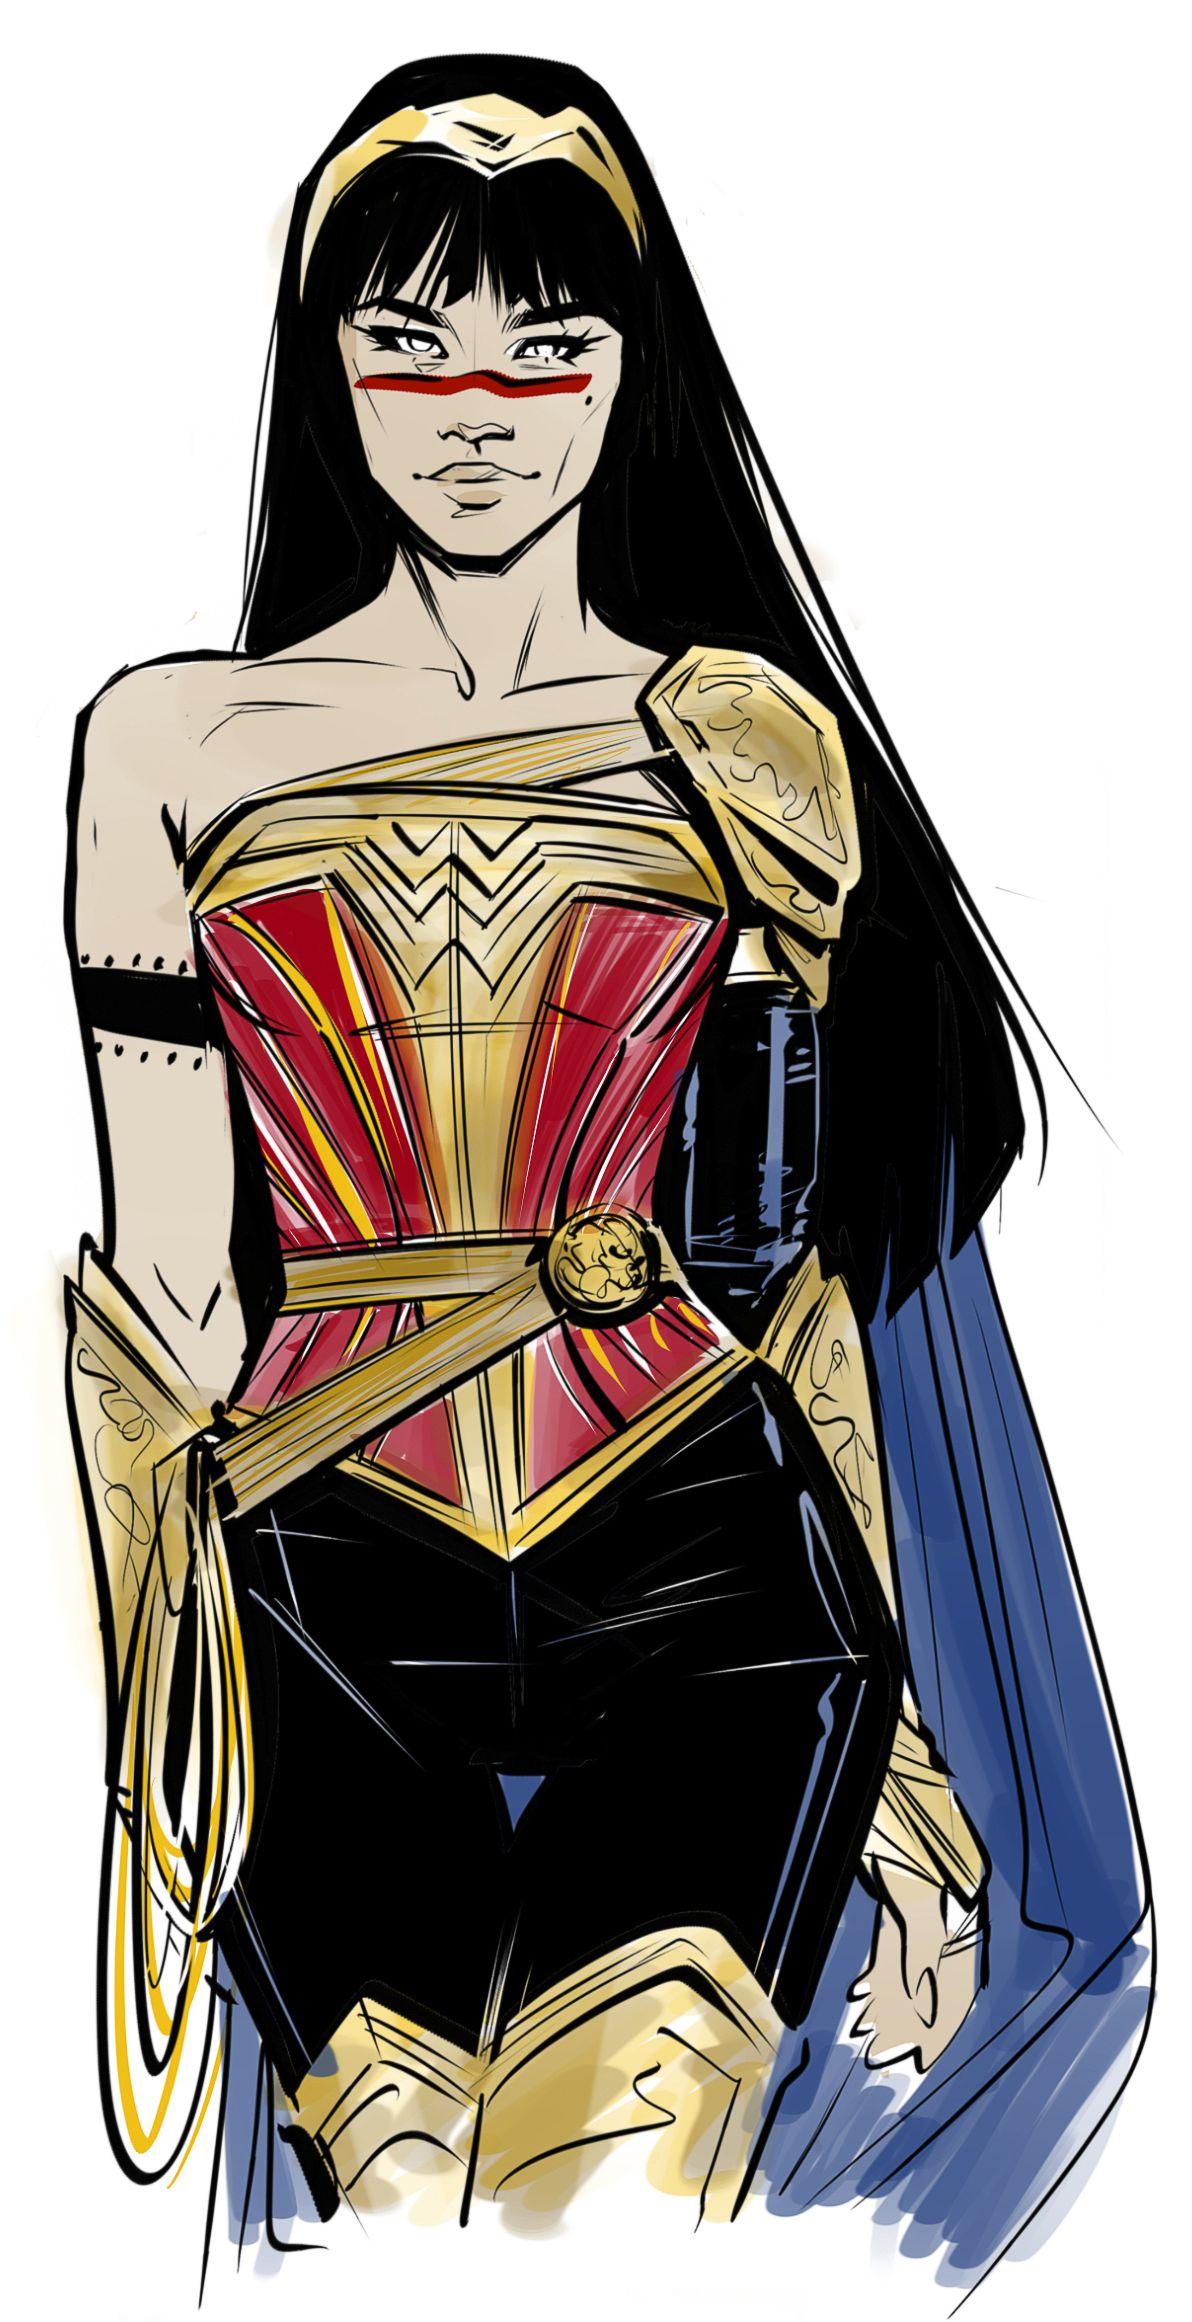 Concept art of an alternate costume for Yara Flor/Wonder Woman.